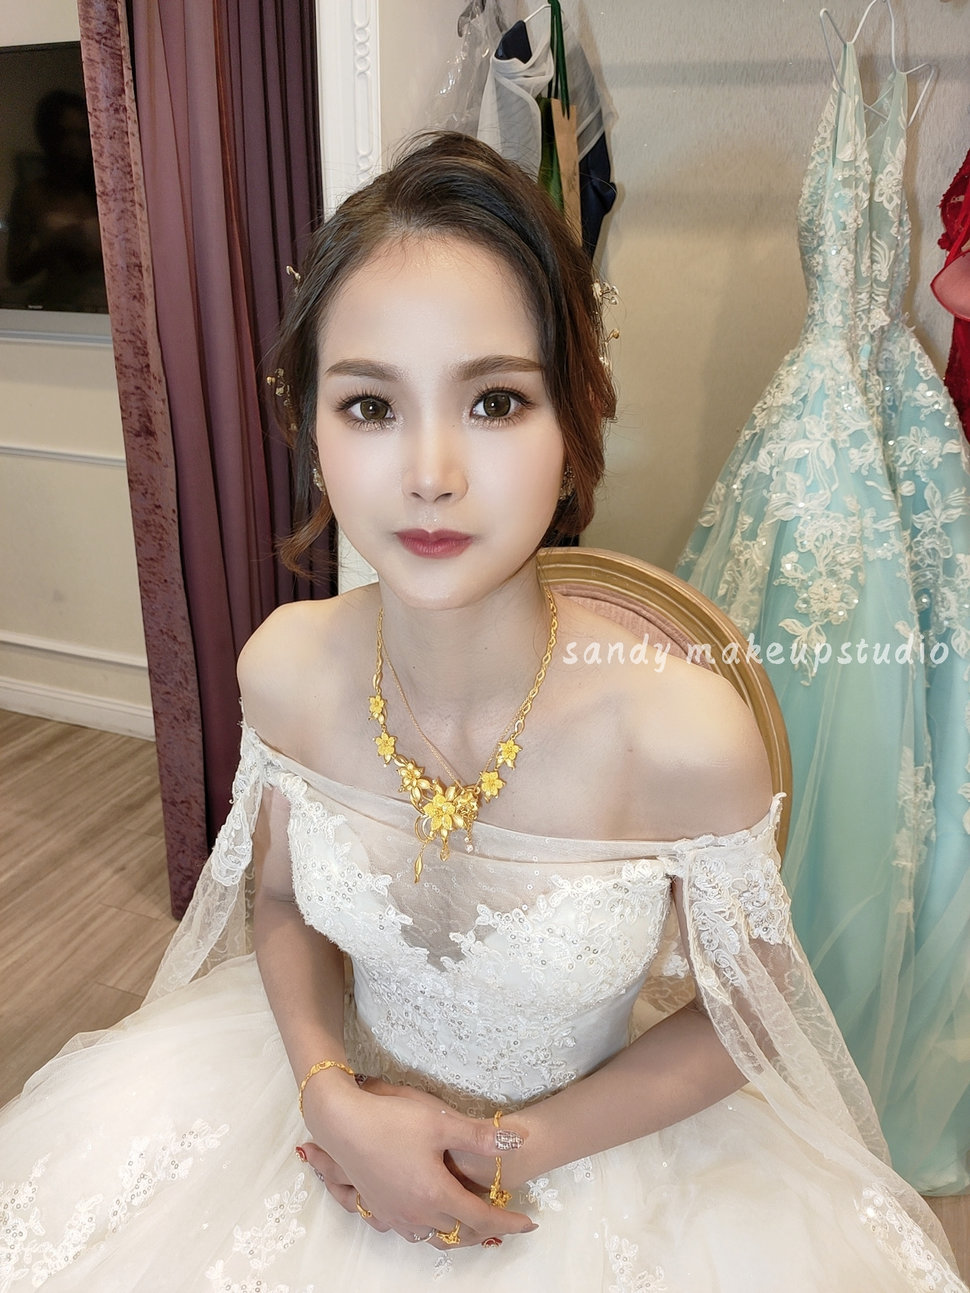 21-01-25-22-58-07-890_deco - 基隆台北全省Sandy新娘秘書《結婚吧》